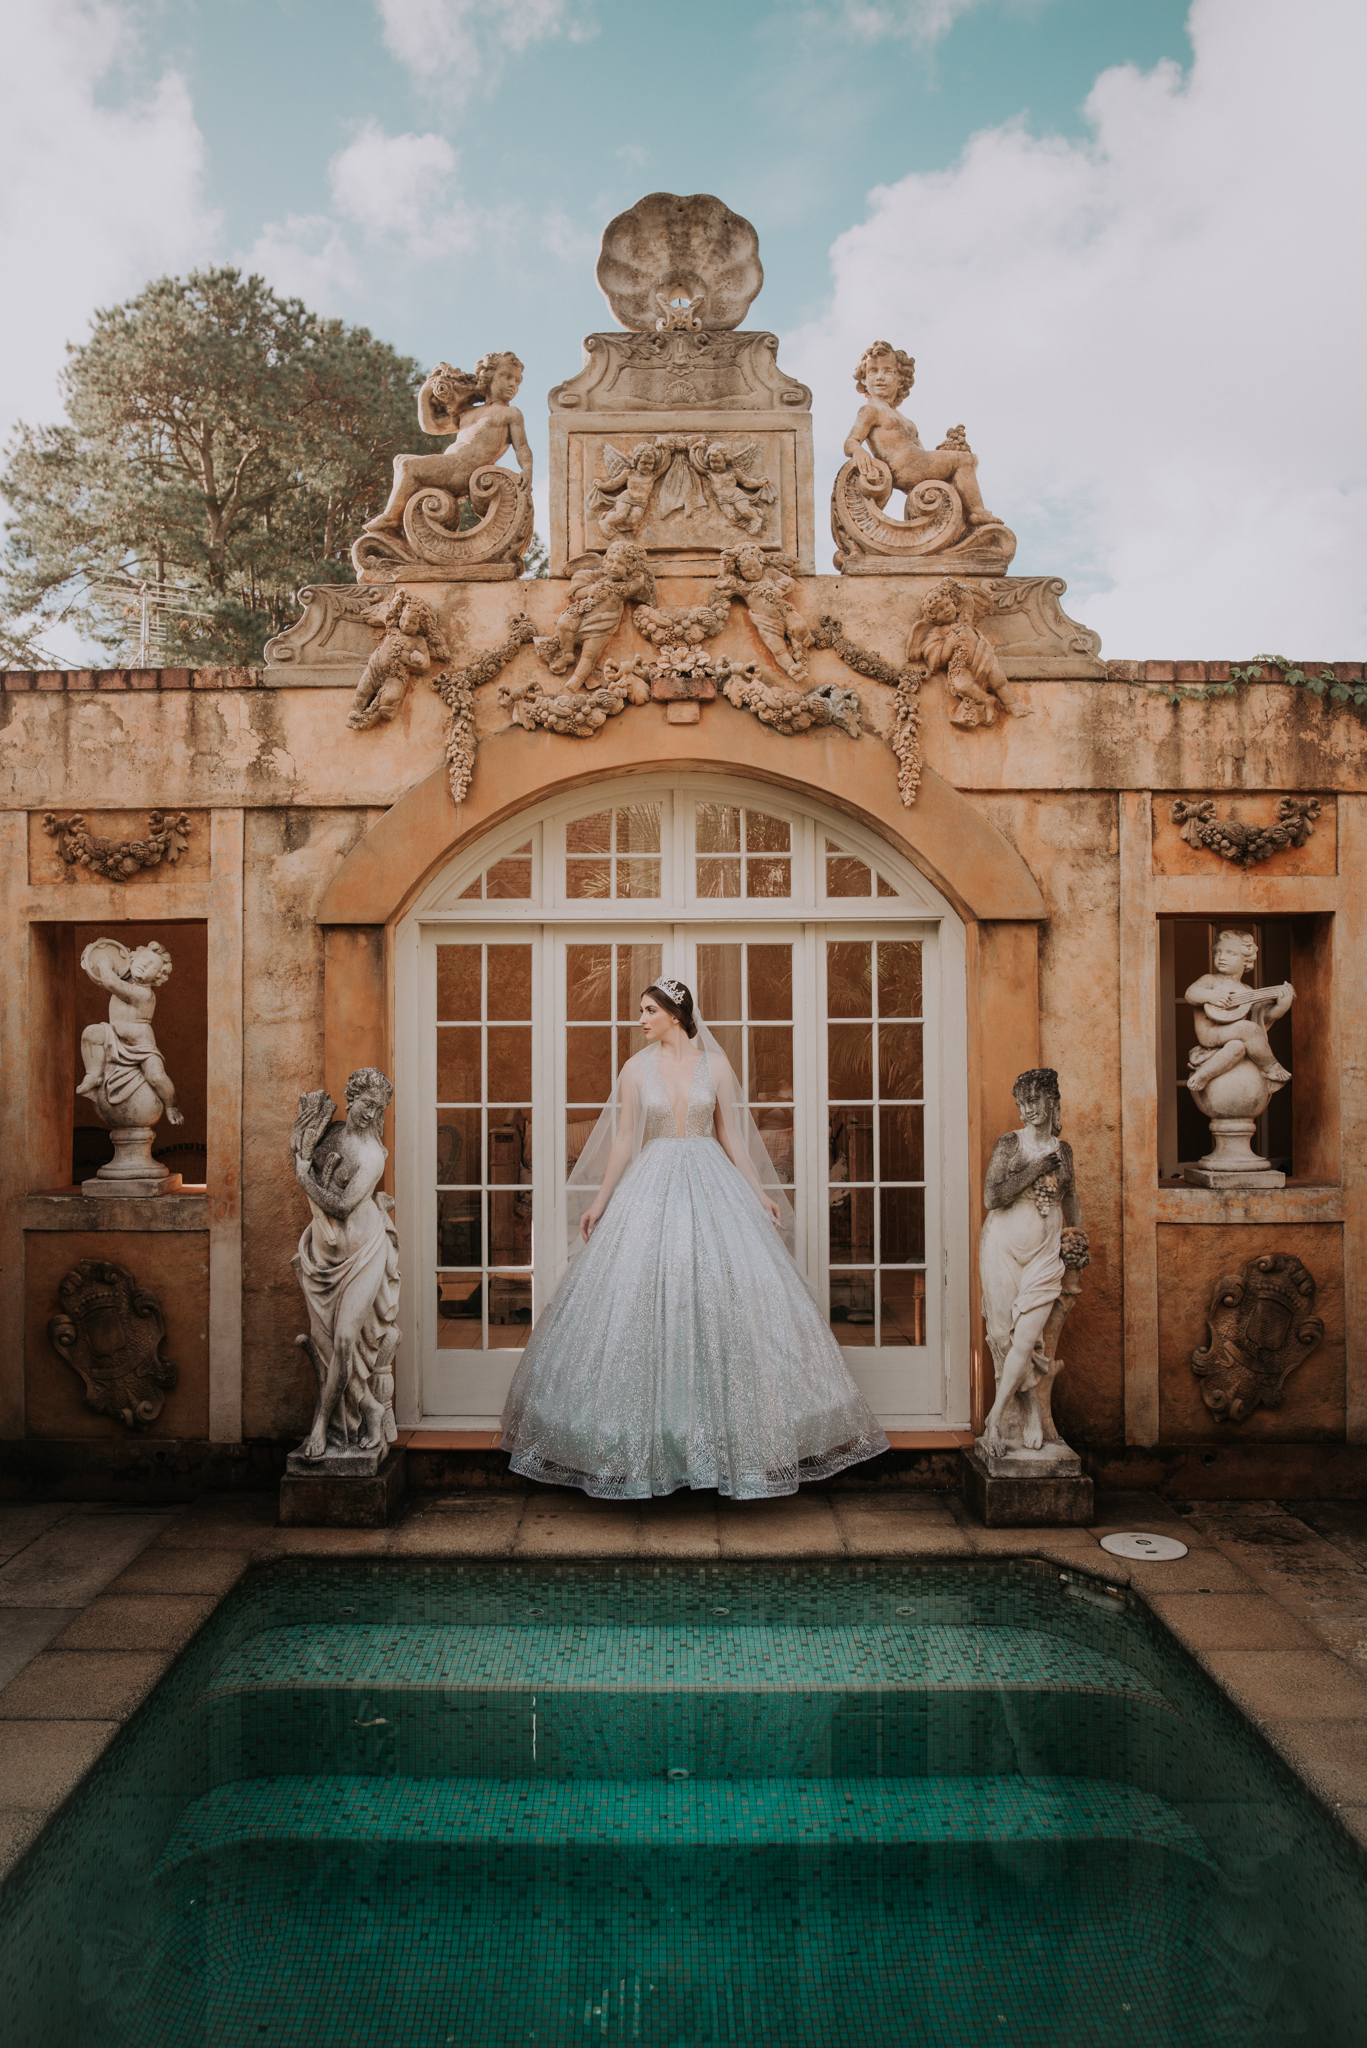 Ulyana Aster Bridal Wedding Gown • Deux Belettes Byron Bay Wedding Photographer • Lovelenscapes • Bloodwood Botanica • Leigh McCoy